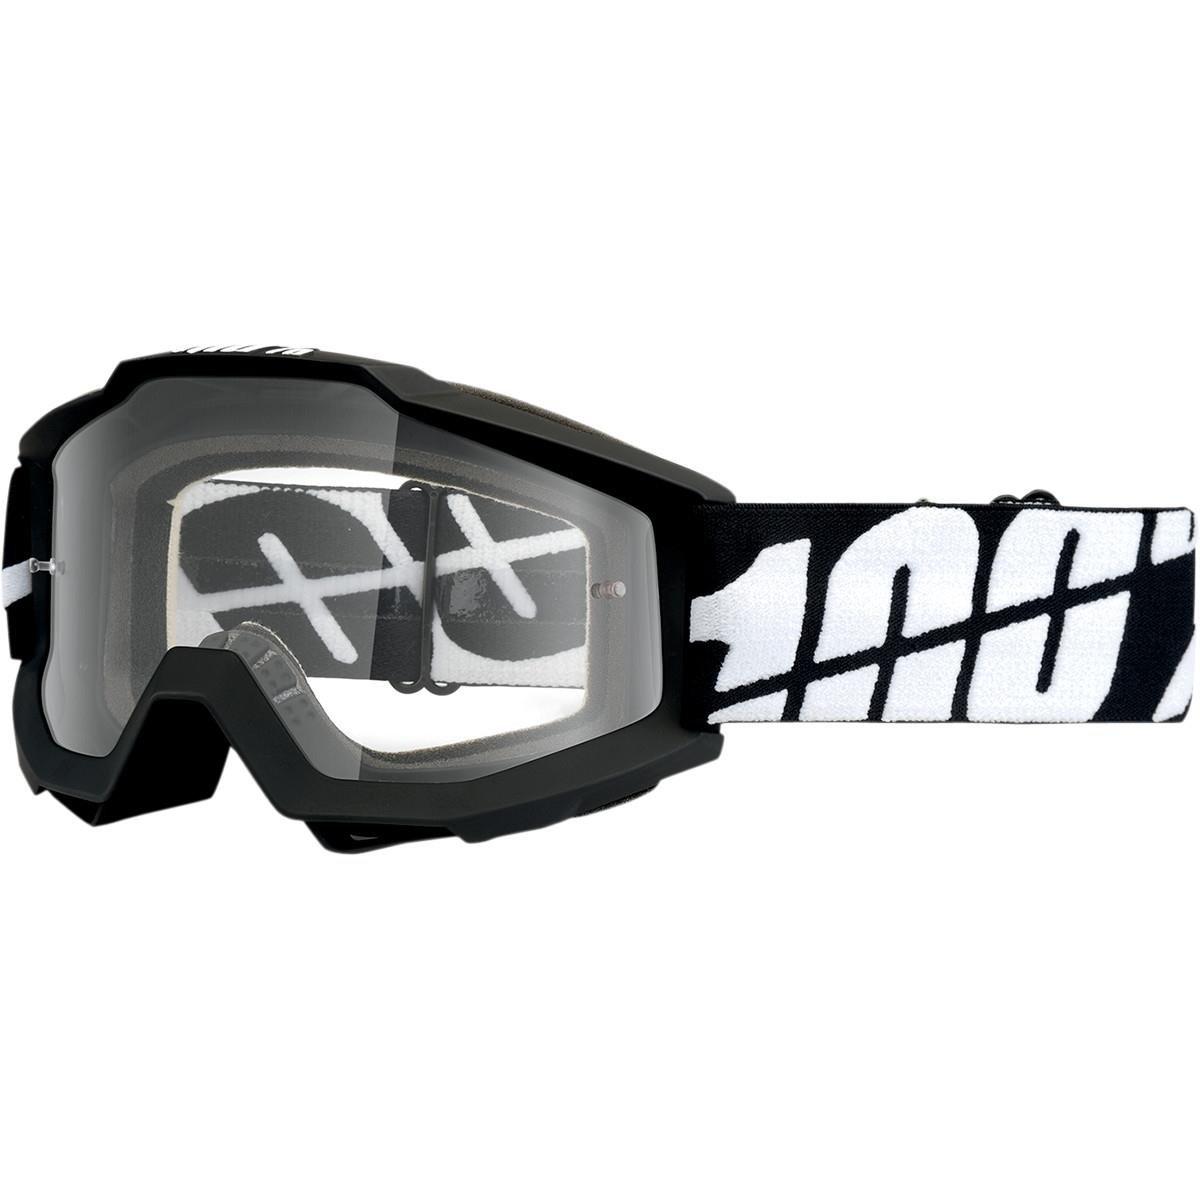 Unbekannt 100% Accuri Maske Black Tornado Display Klar